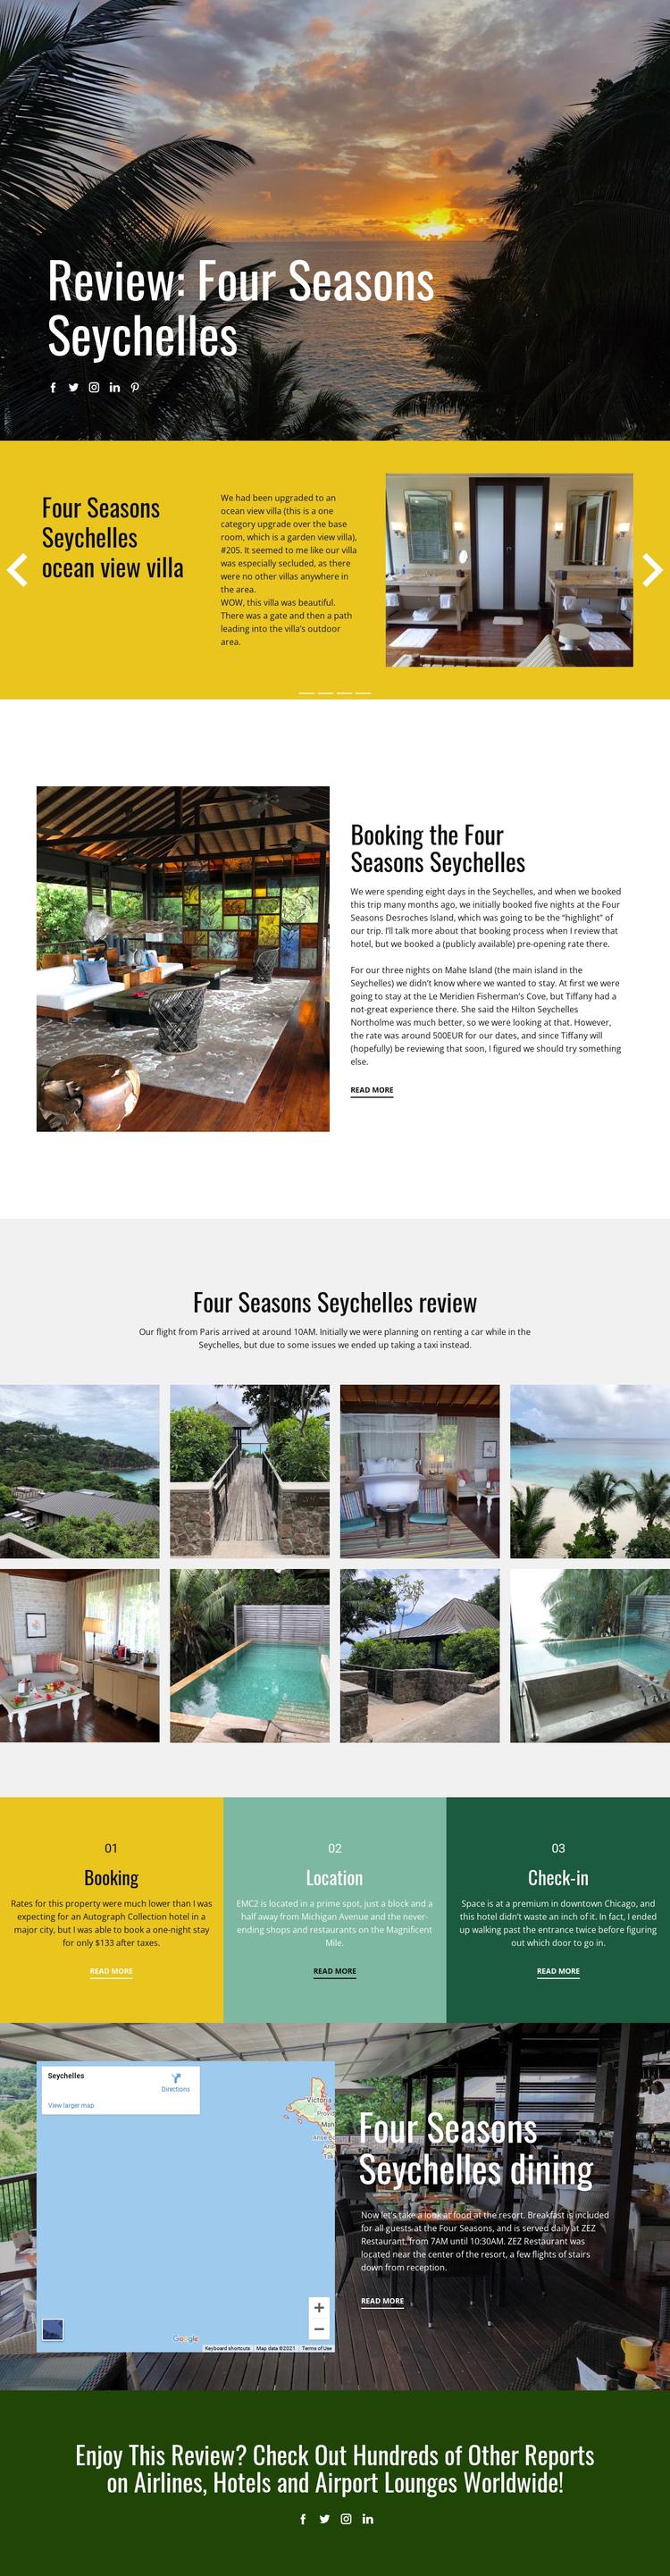 Four Seasons Website Builder Software